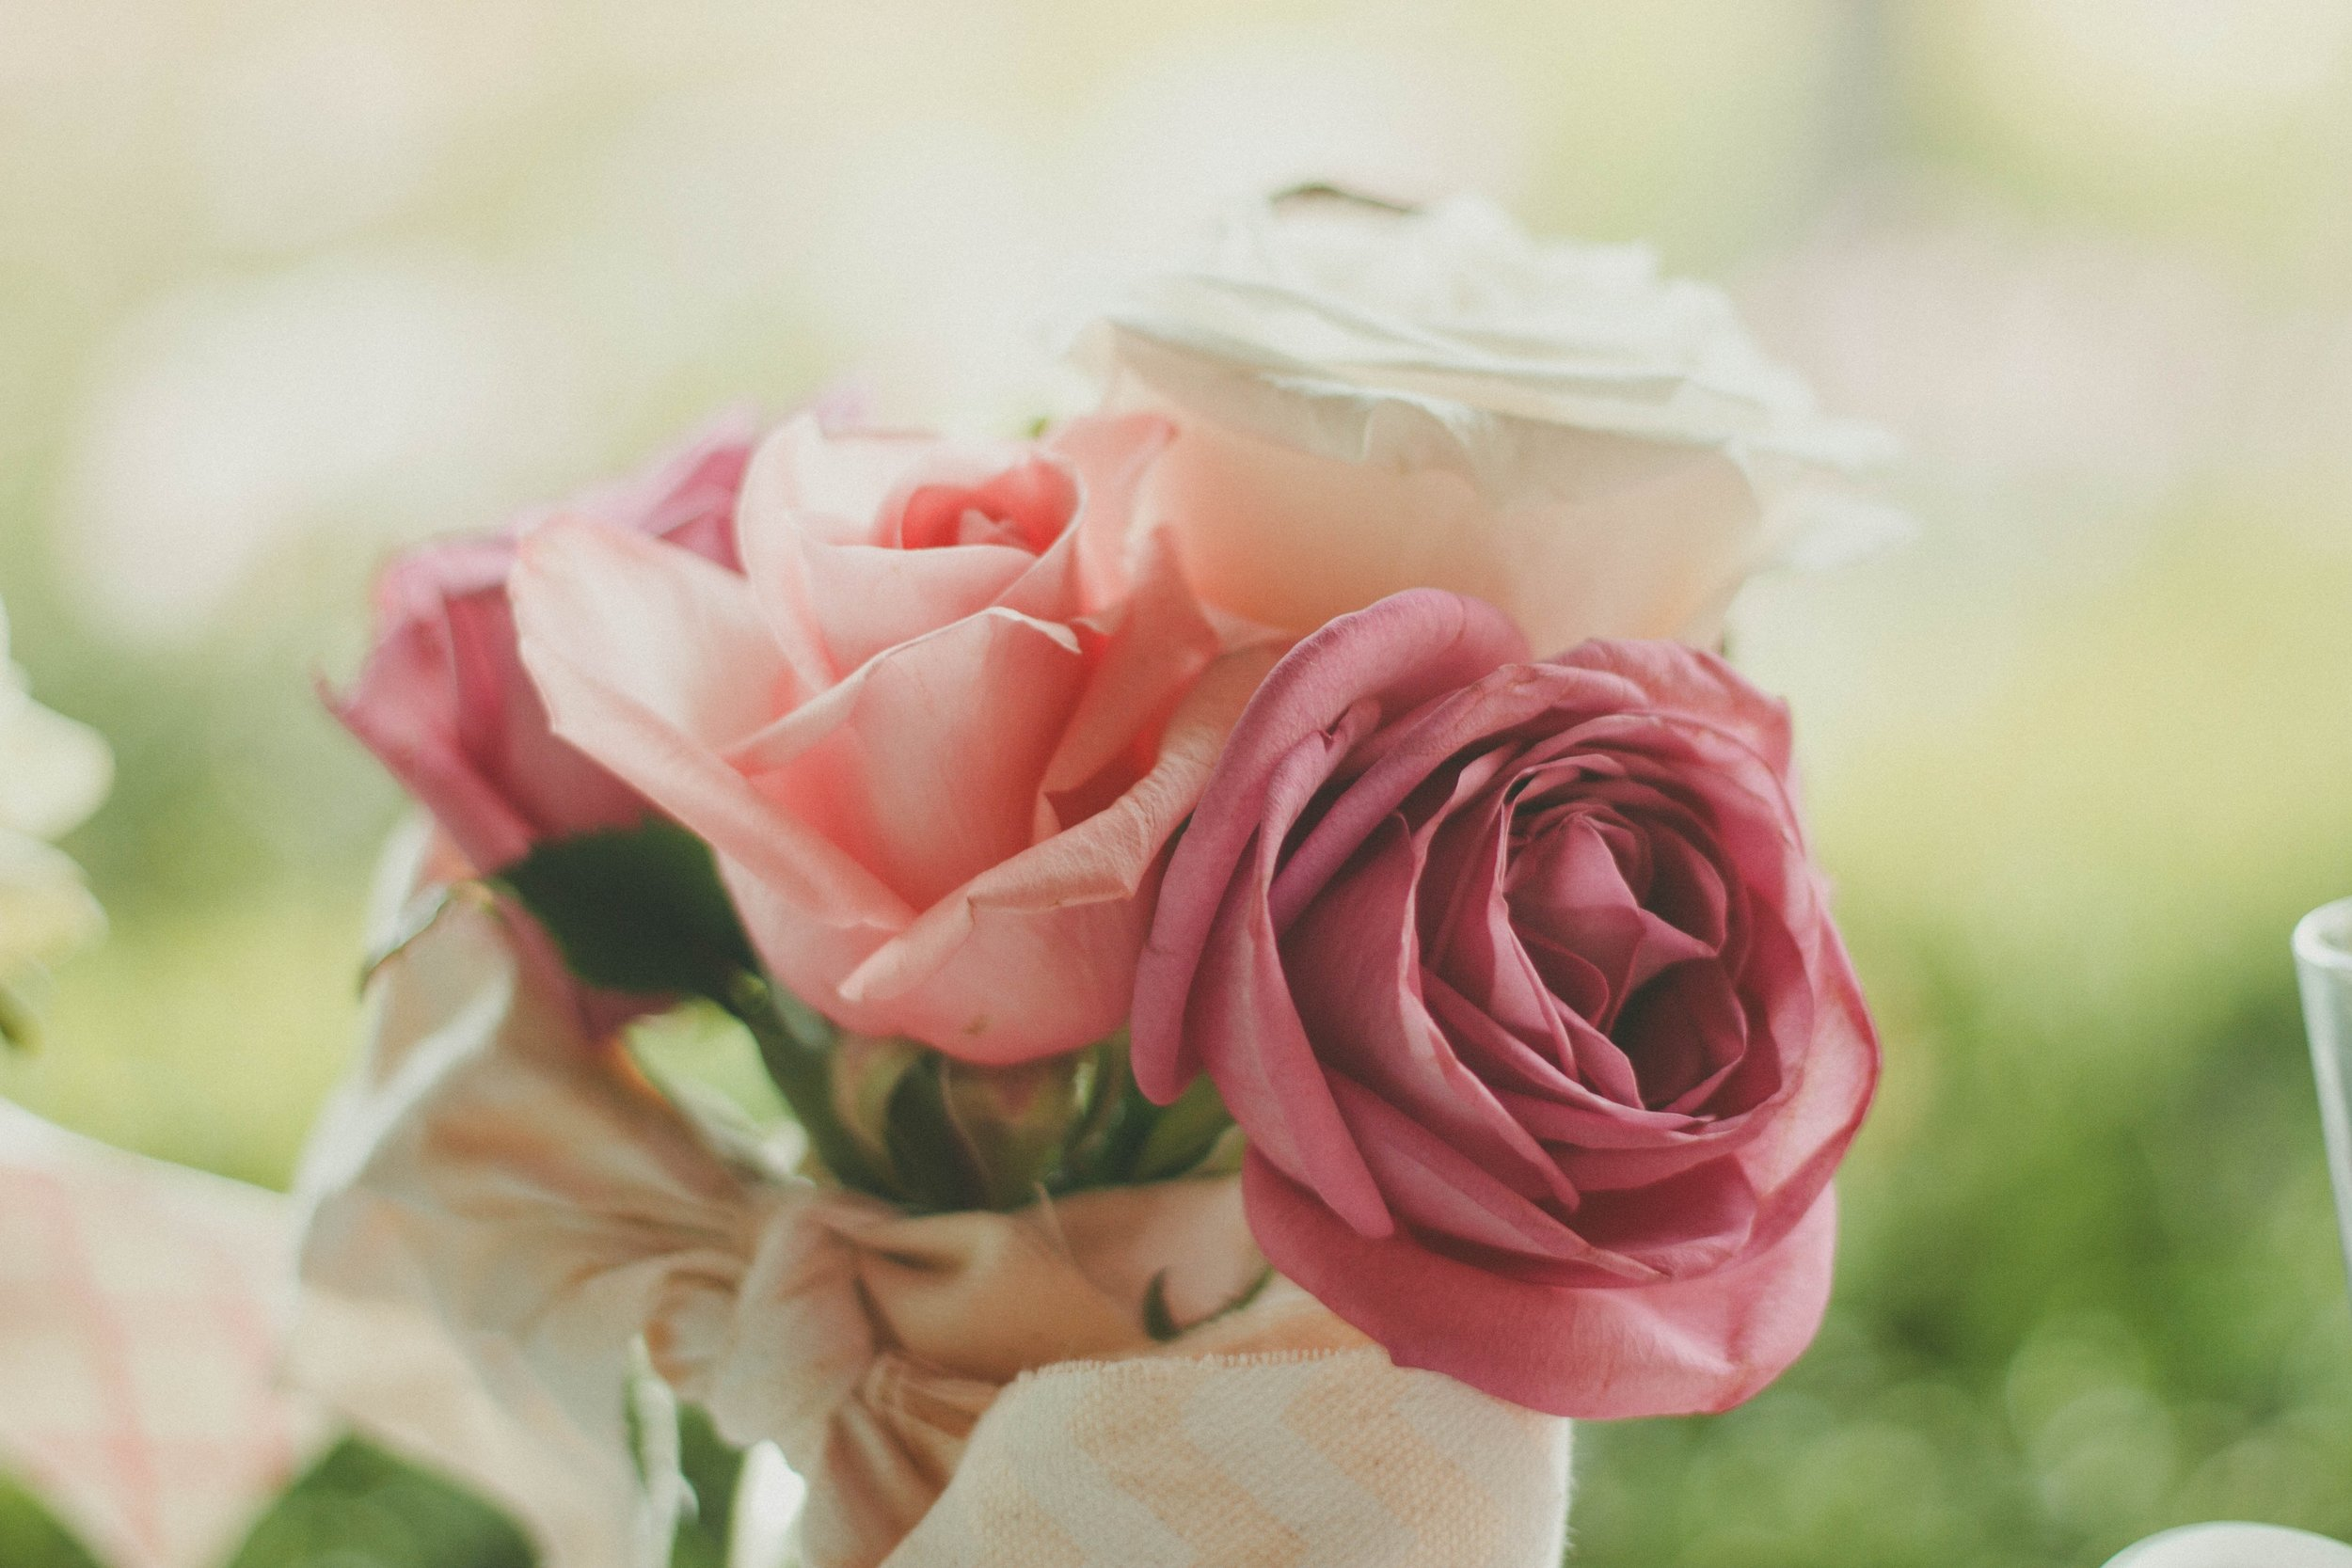 I Love You Flower Heart Wreath Purse Bag Hanger Holder Hook